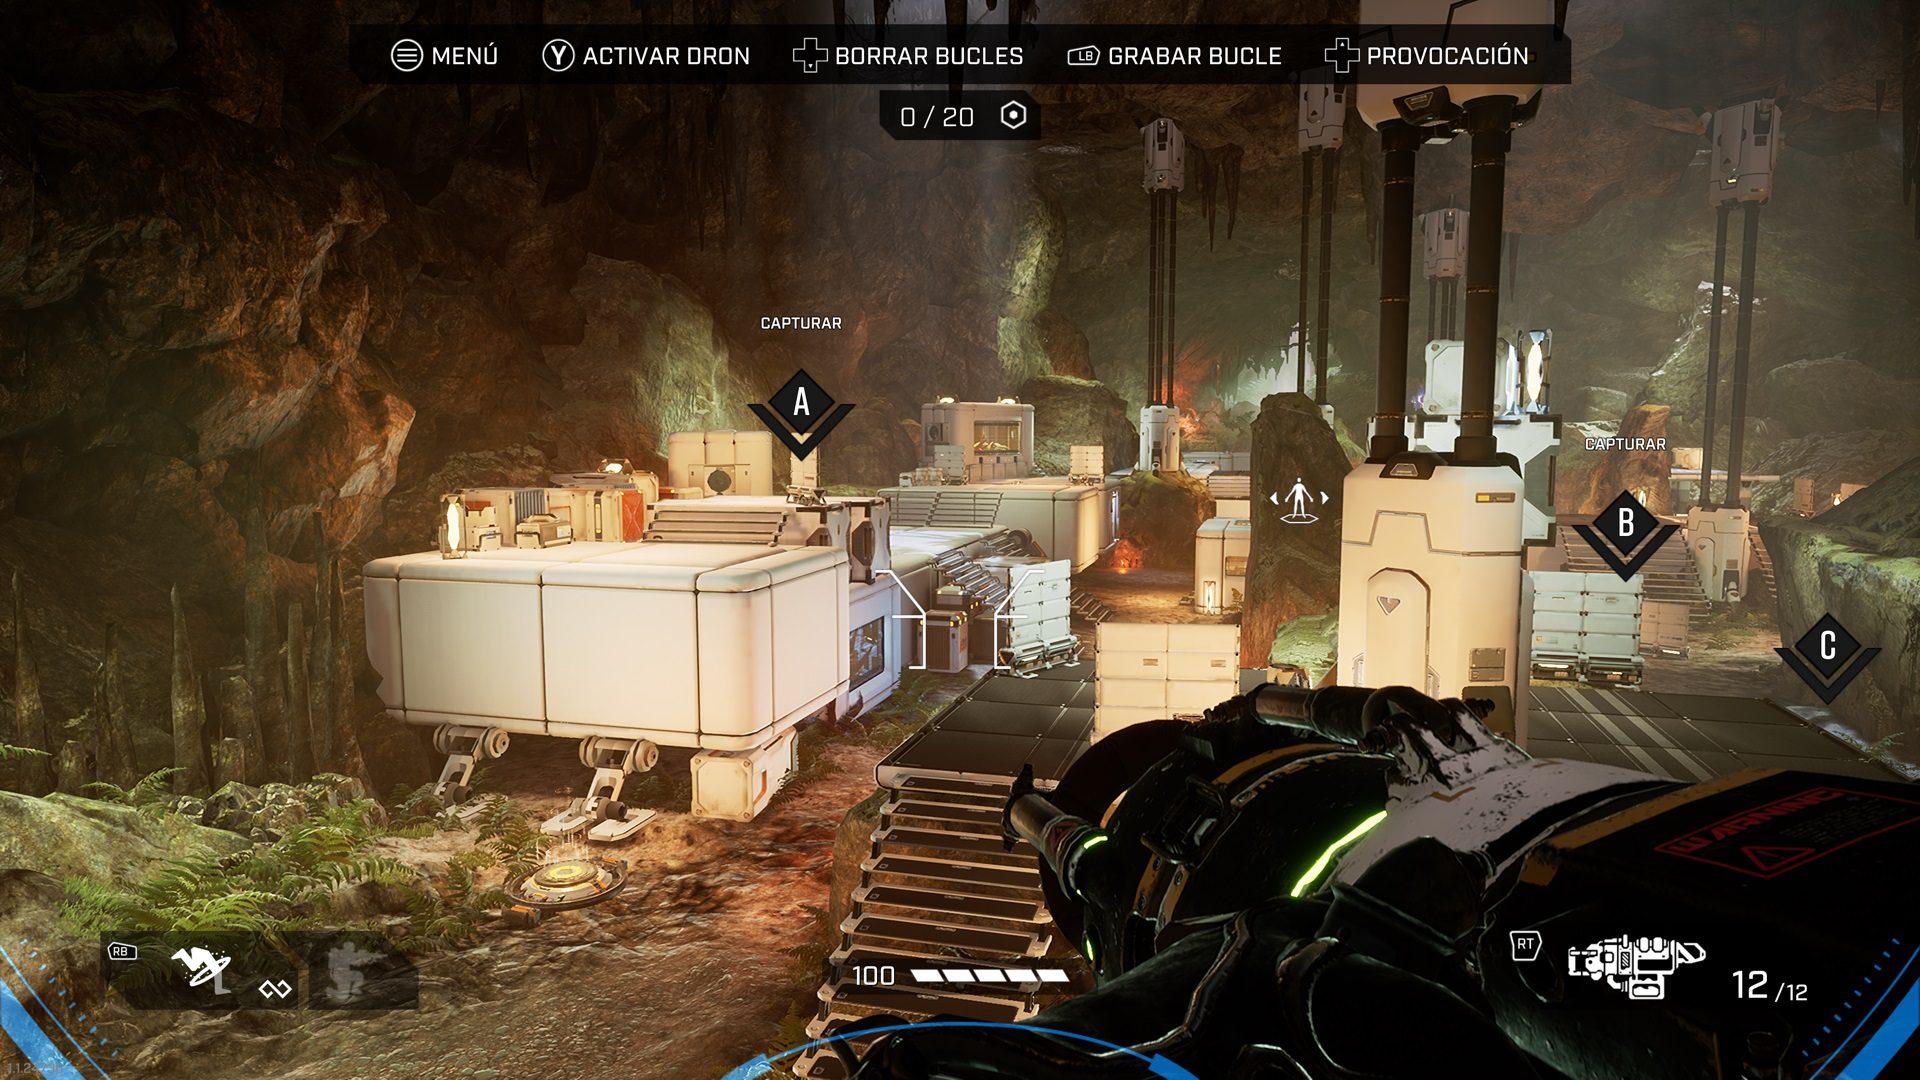 Análisis de Lemnis Gate - Hoy os traemos el análisis de un shooter competitivo con un toque estrategico, Lemnis Gate